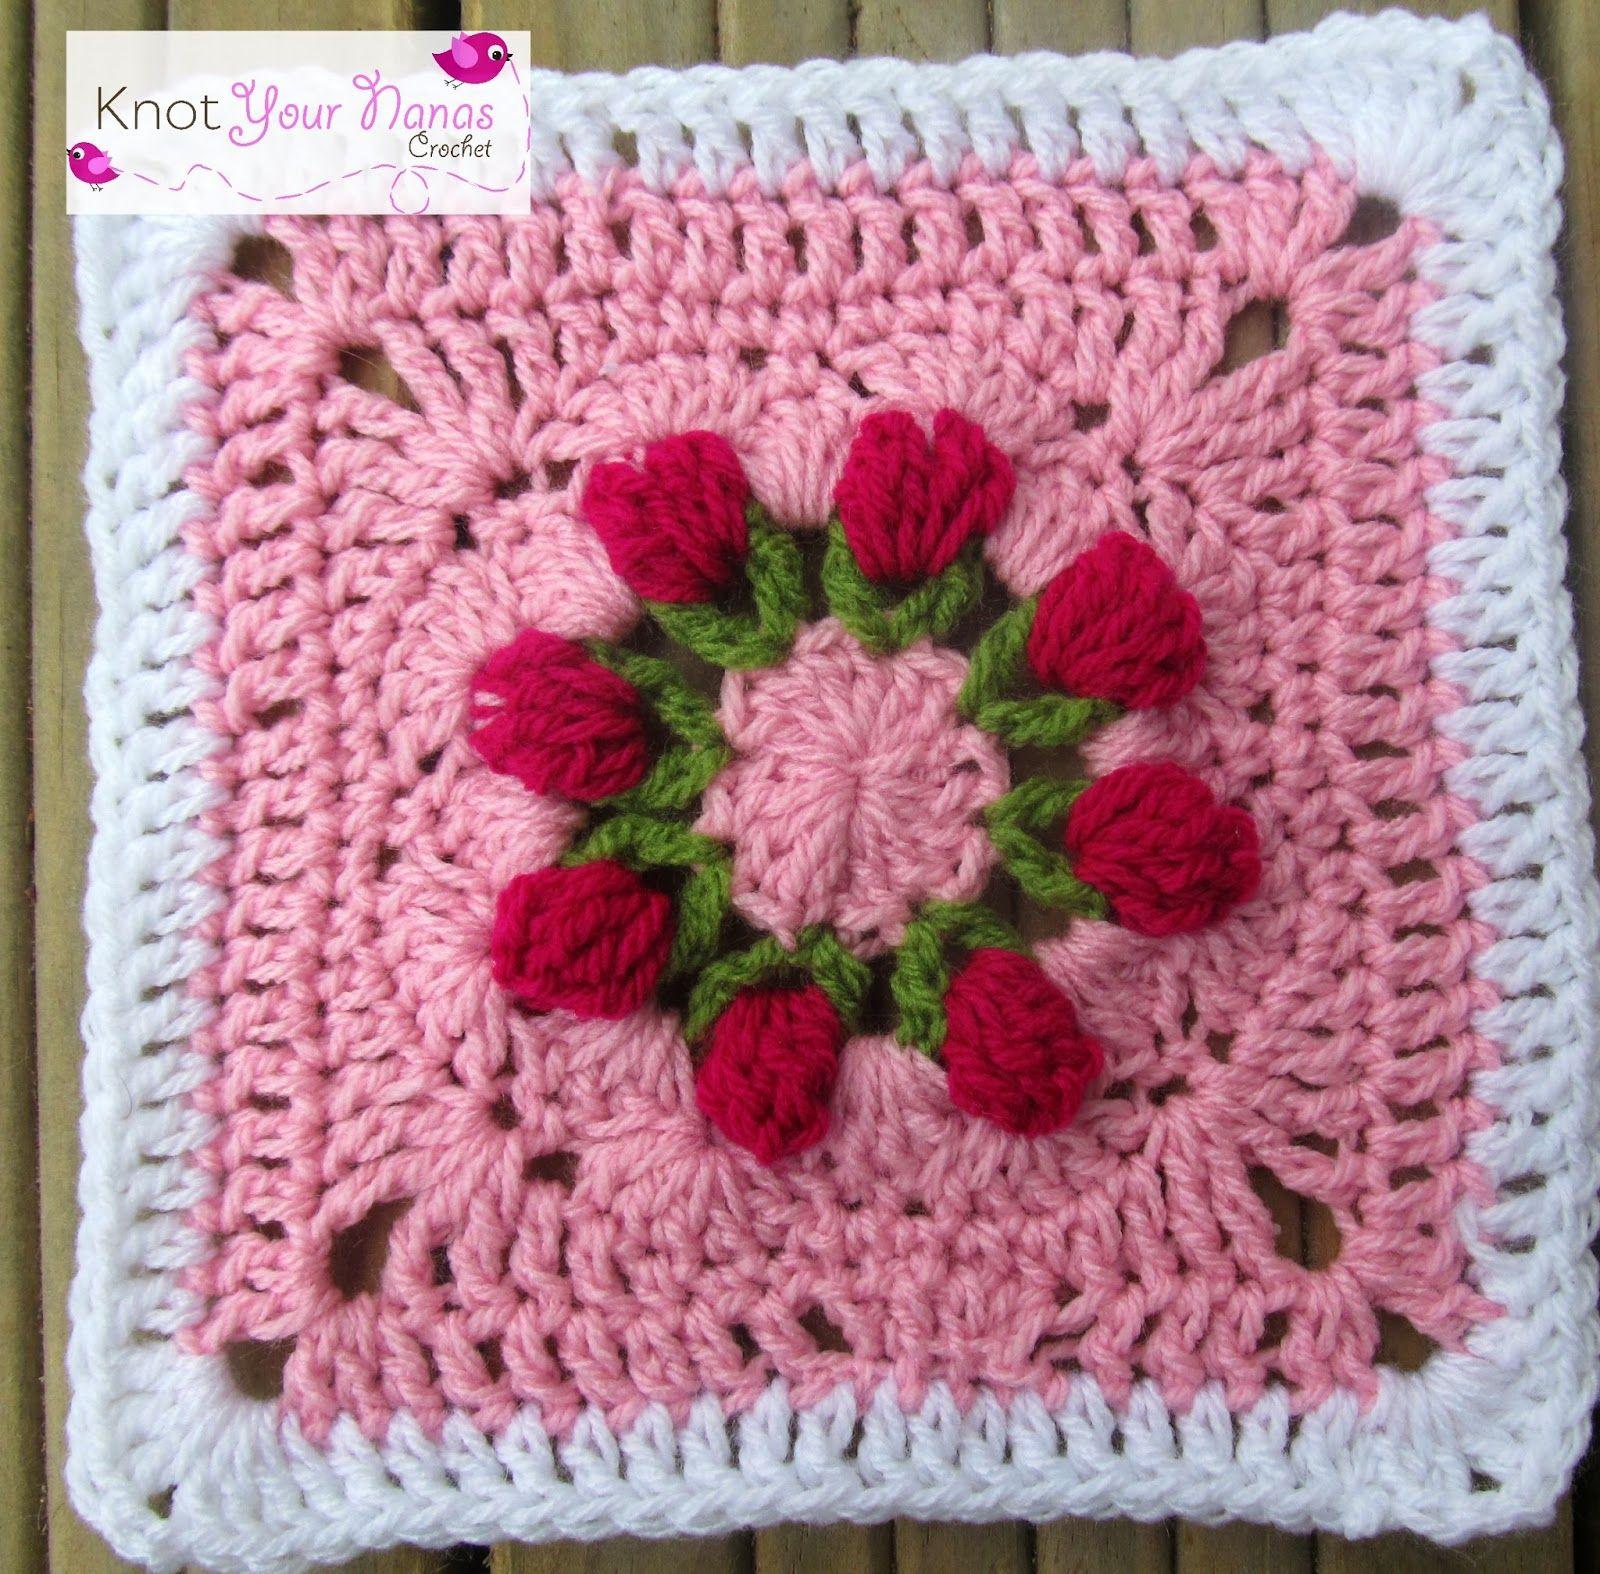 Knot Your Nana\'s Crochet: Granny Square Crochet Along Revisited ...